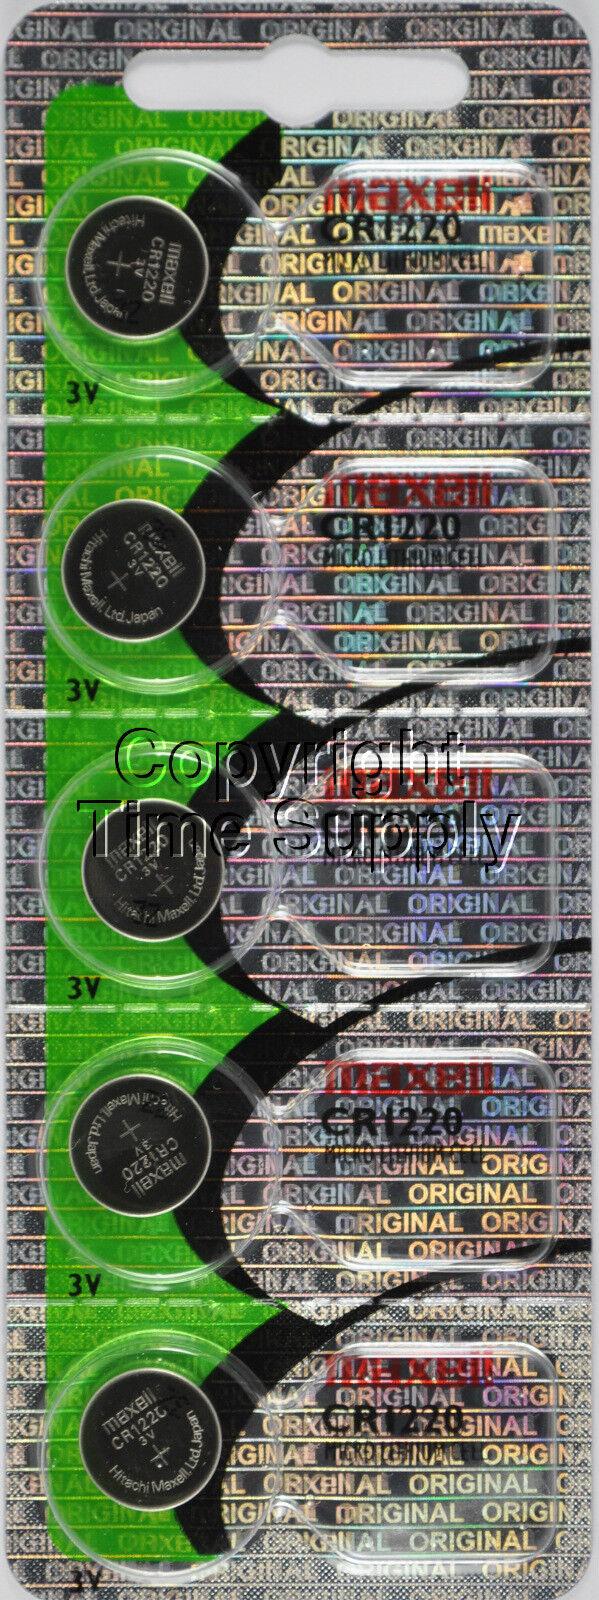 Maxell original 1220 CR 1220 Lithium 3V Battery ( 5 PC )